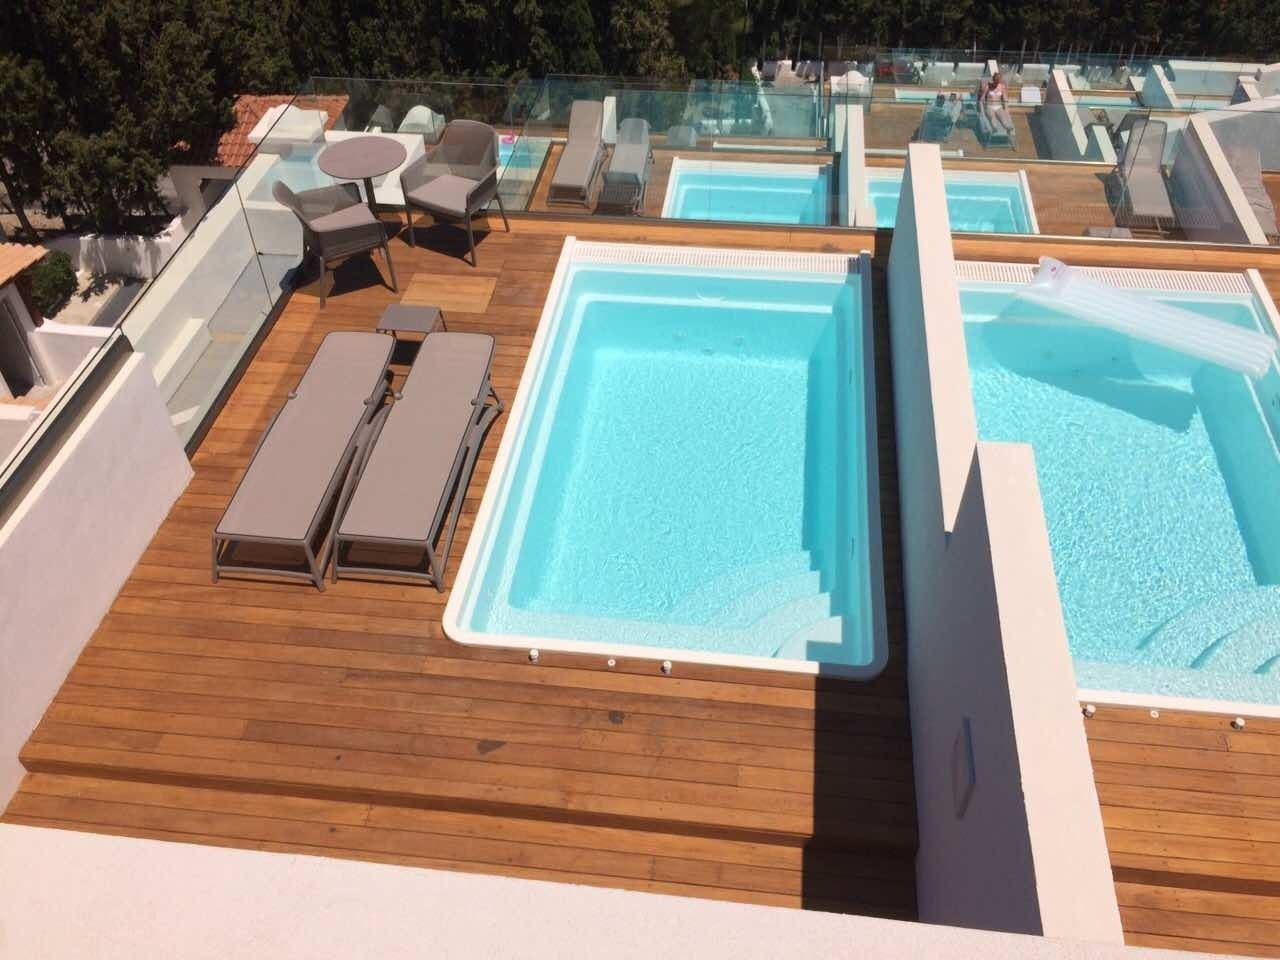 Fibreglass one-piece swimming pool 4m x 2.5 x 1.25